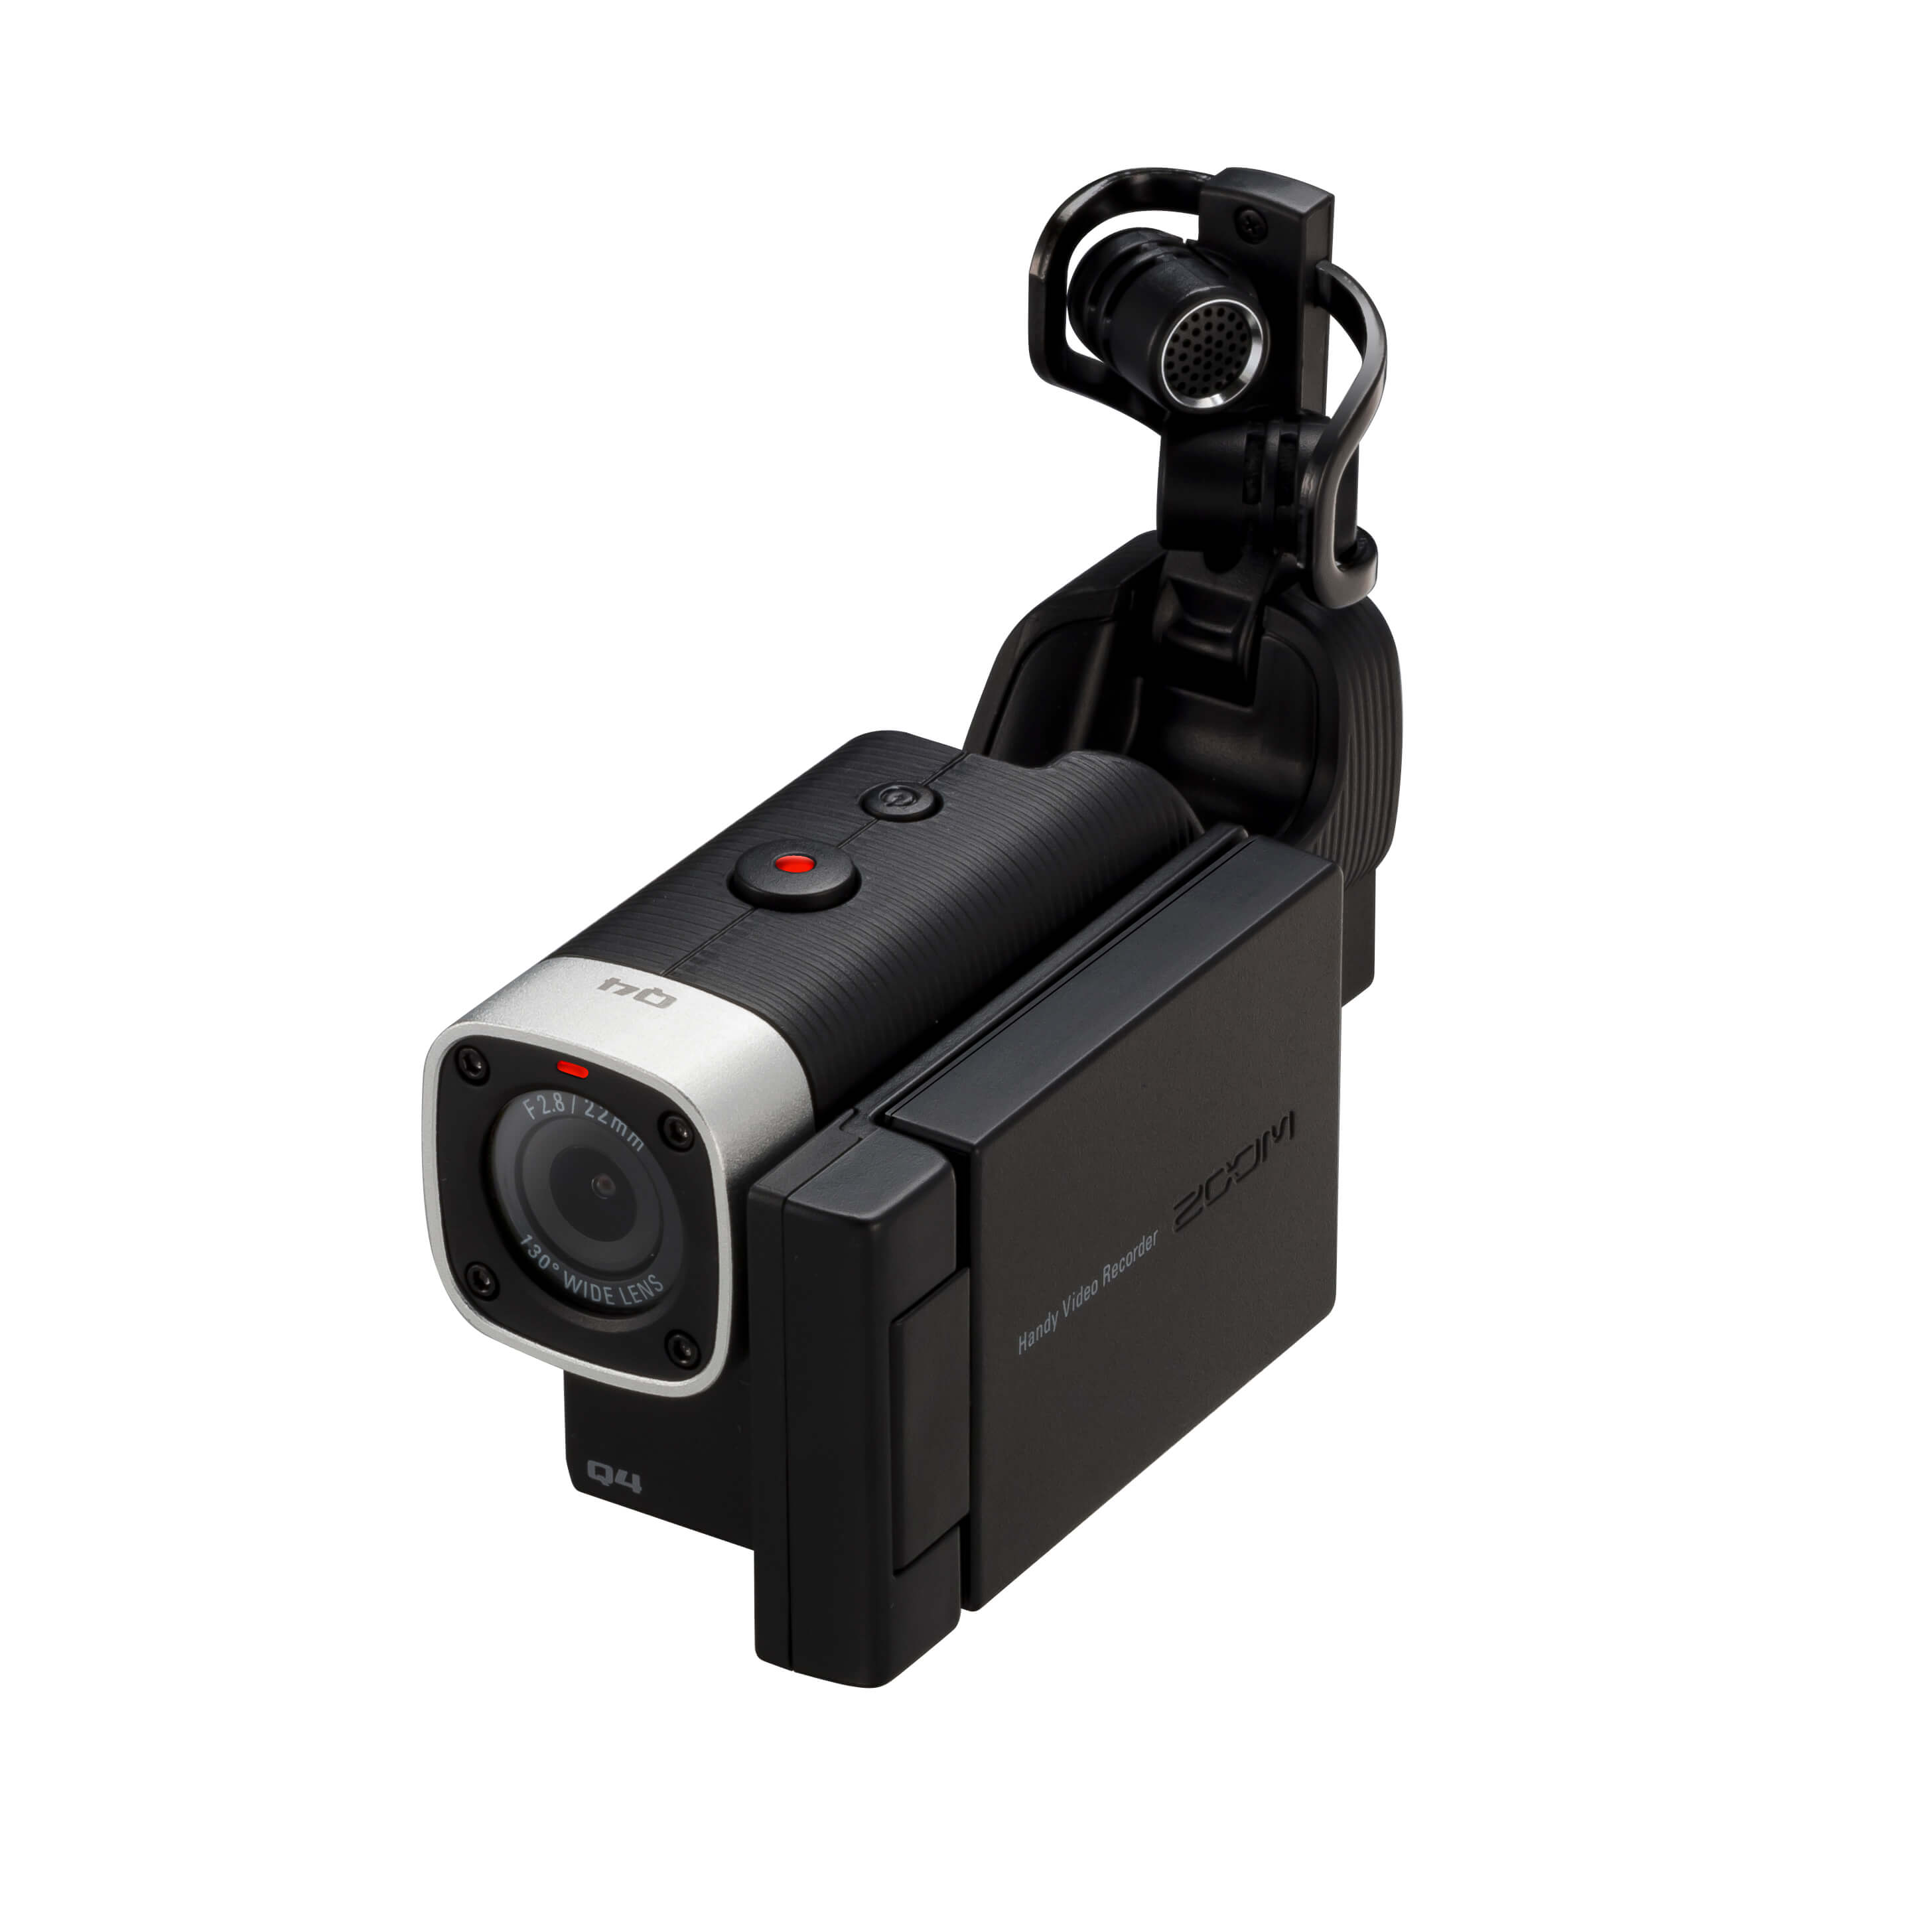 ZOOM Q4 专业录音摄影机一体机 吉他弹唱 Q3HD升级 中文电源